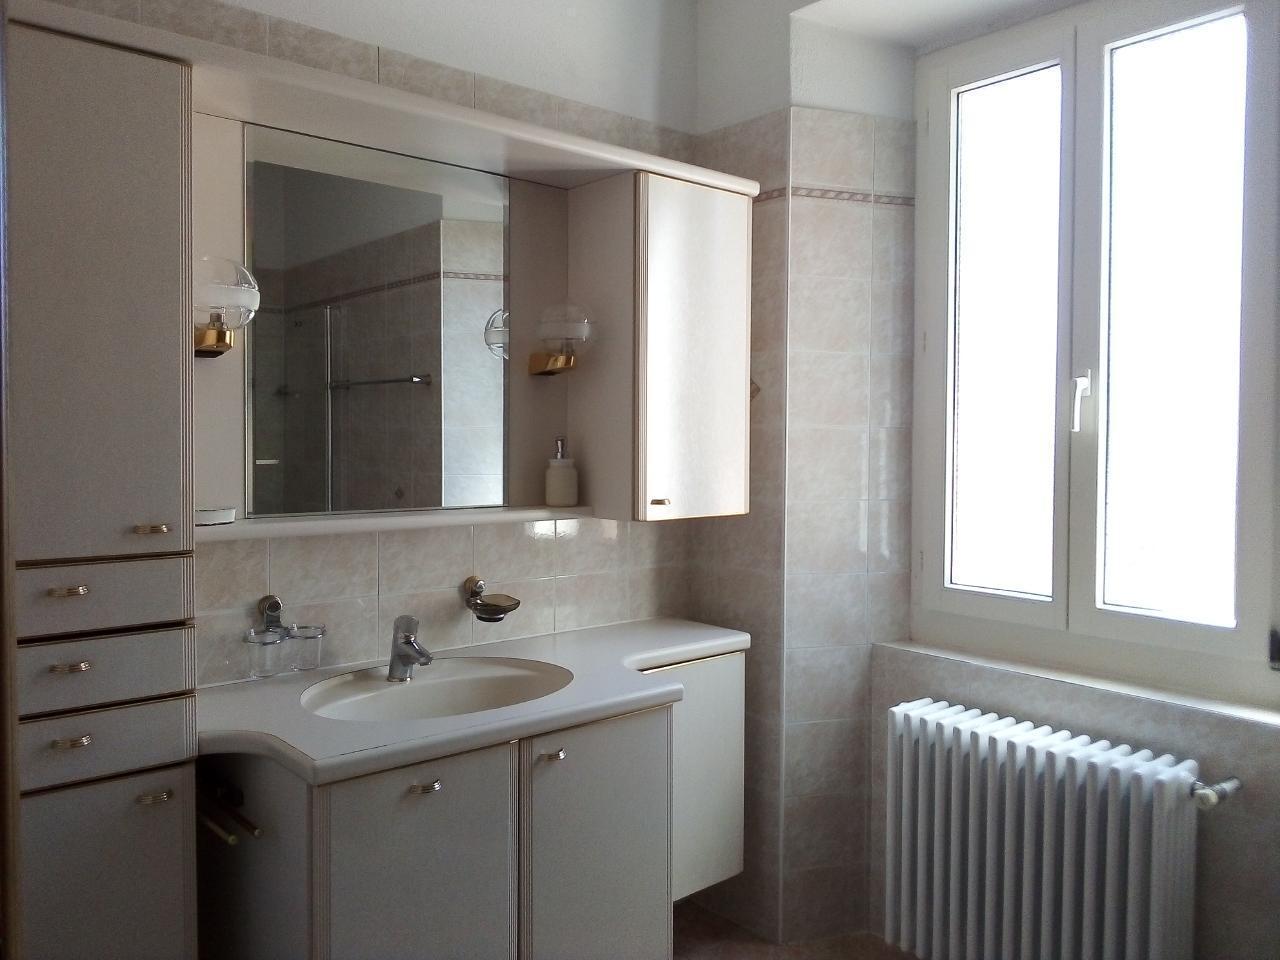 Appartement de vacances Grosszügige Wohnung im historischen Tessinerhaus (2617724), Sessa, Lac de Lugano (CH), Tessin, Suisse, image 8